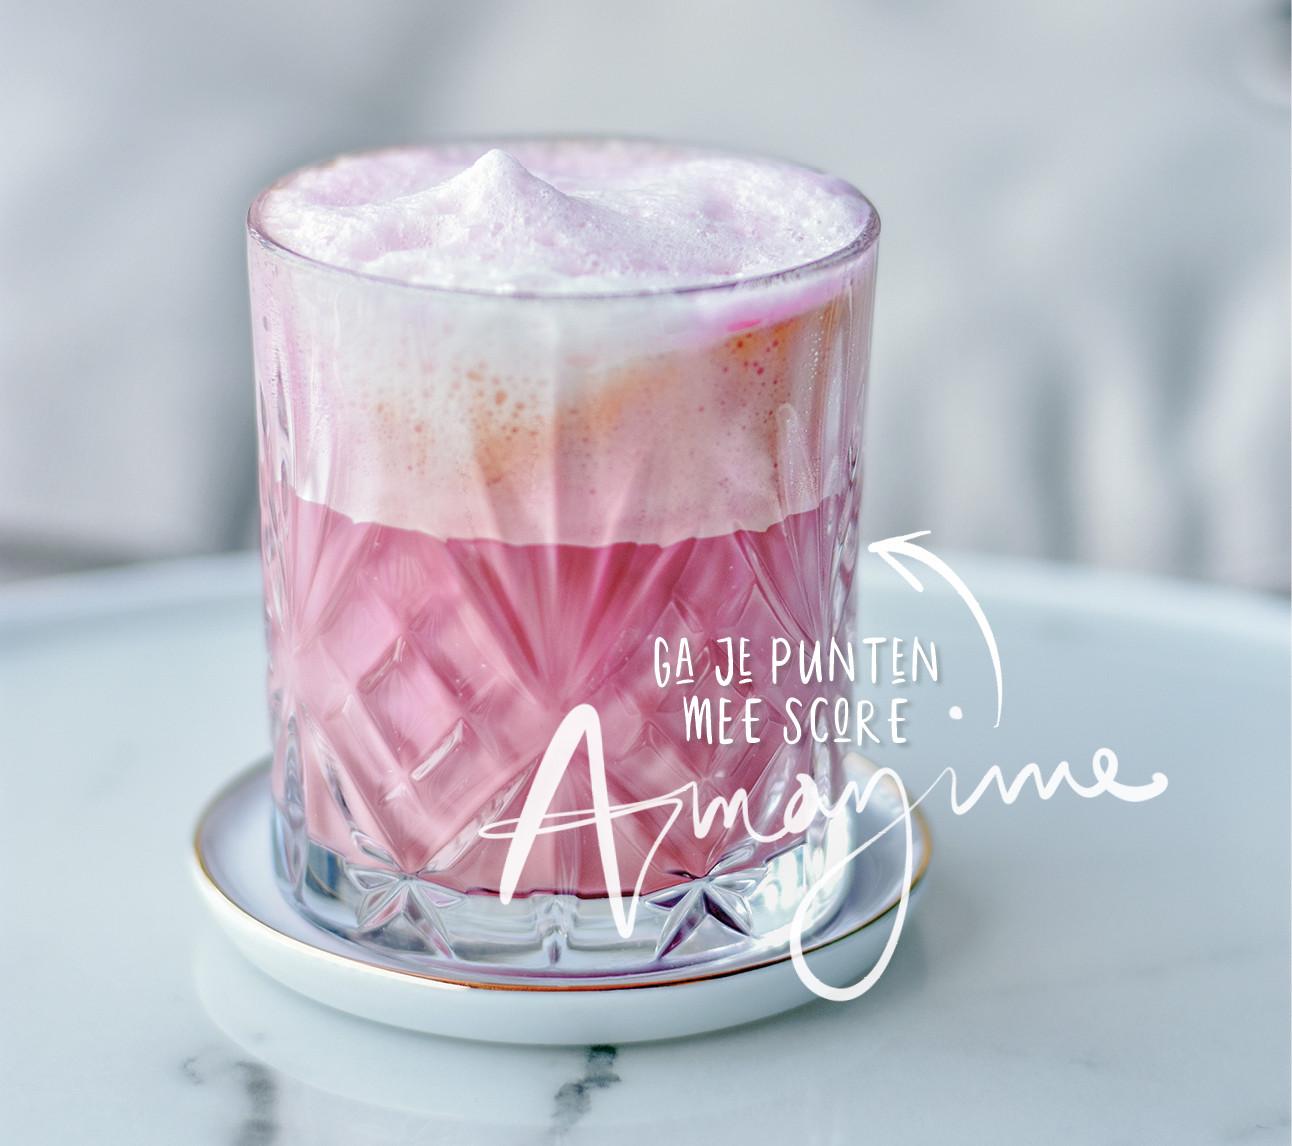 Zo roze en zo lekker: pink cappuccino